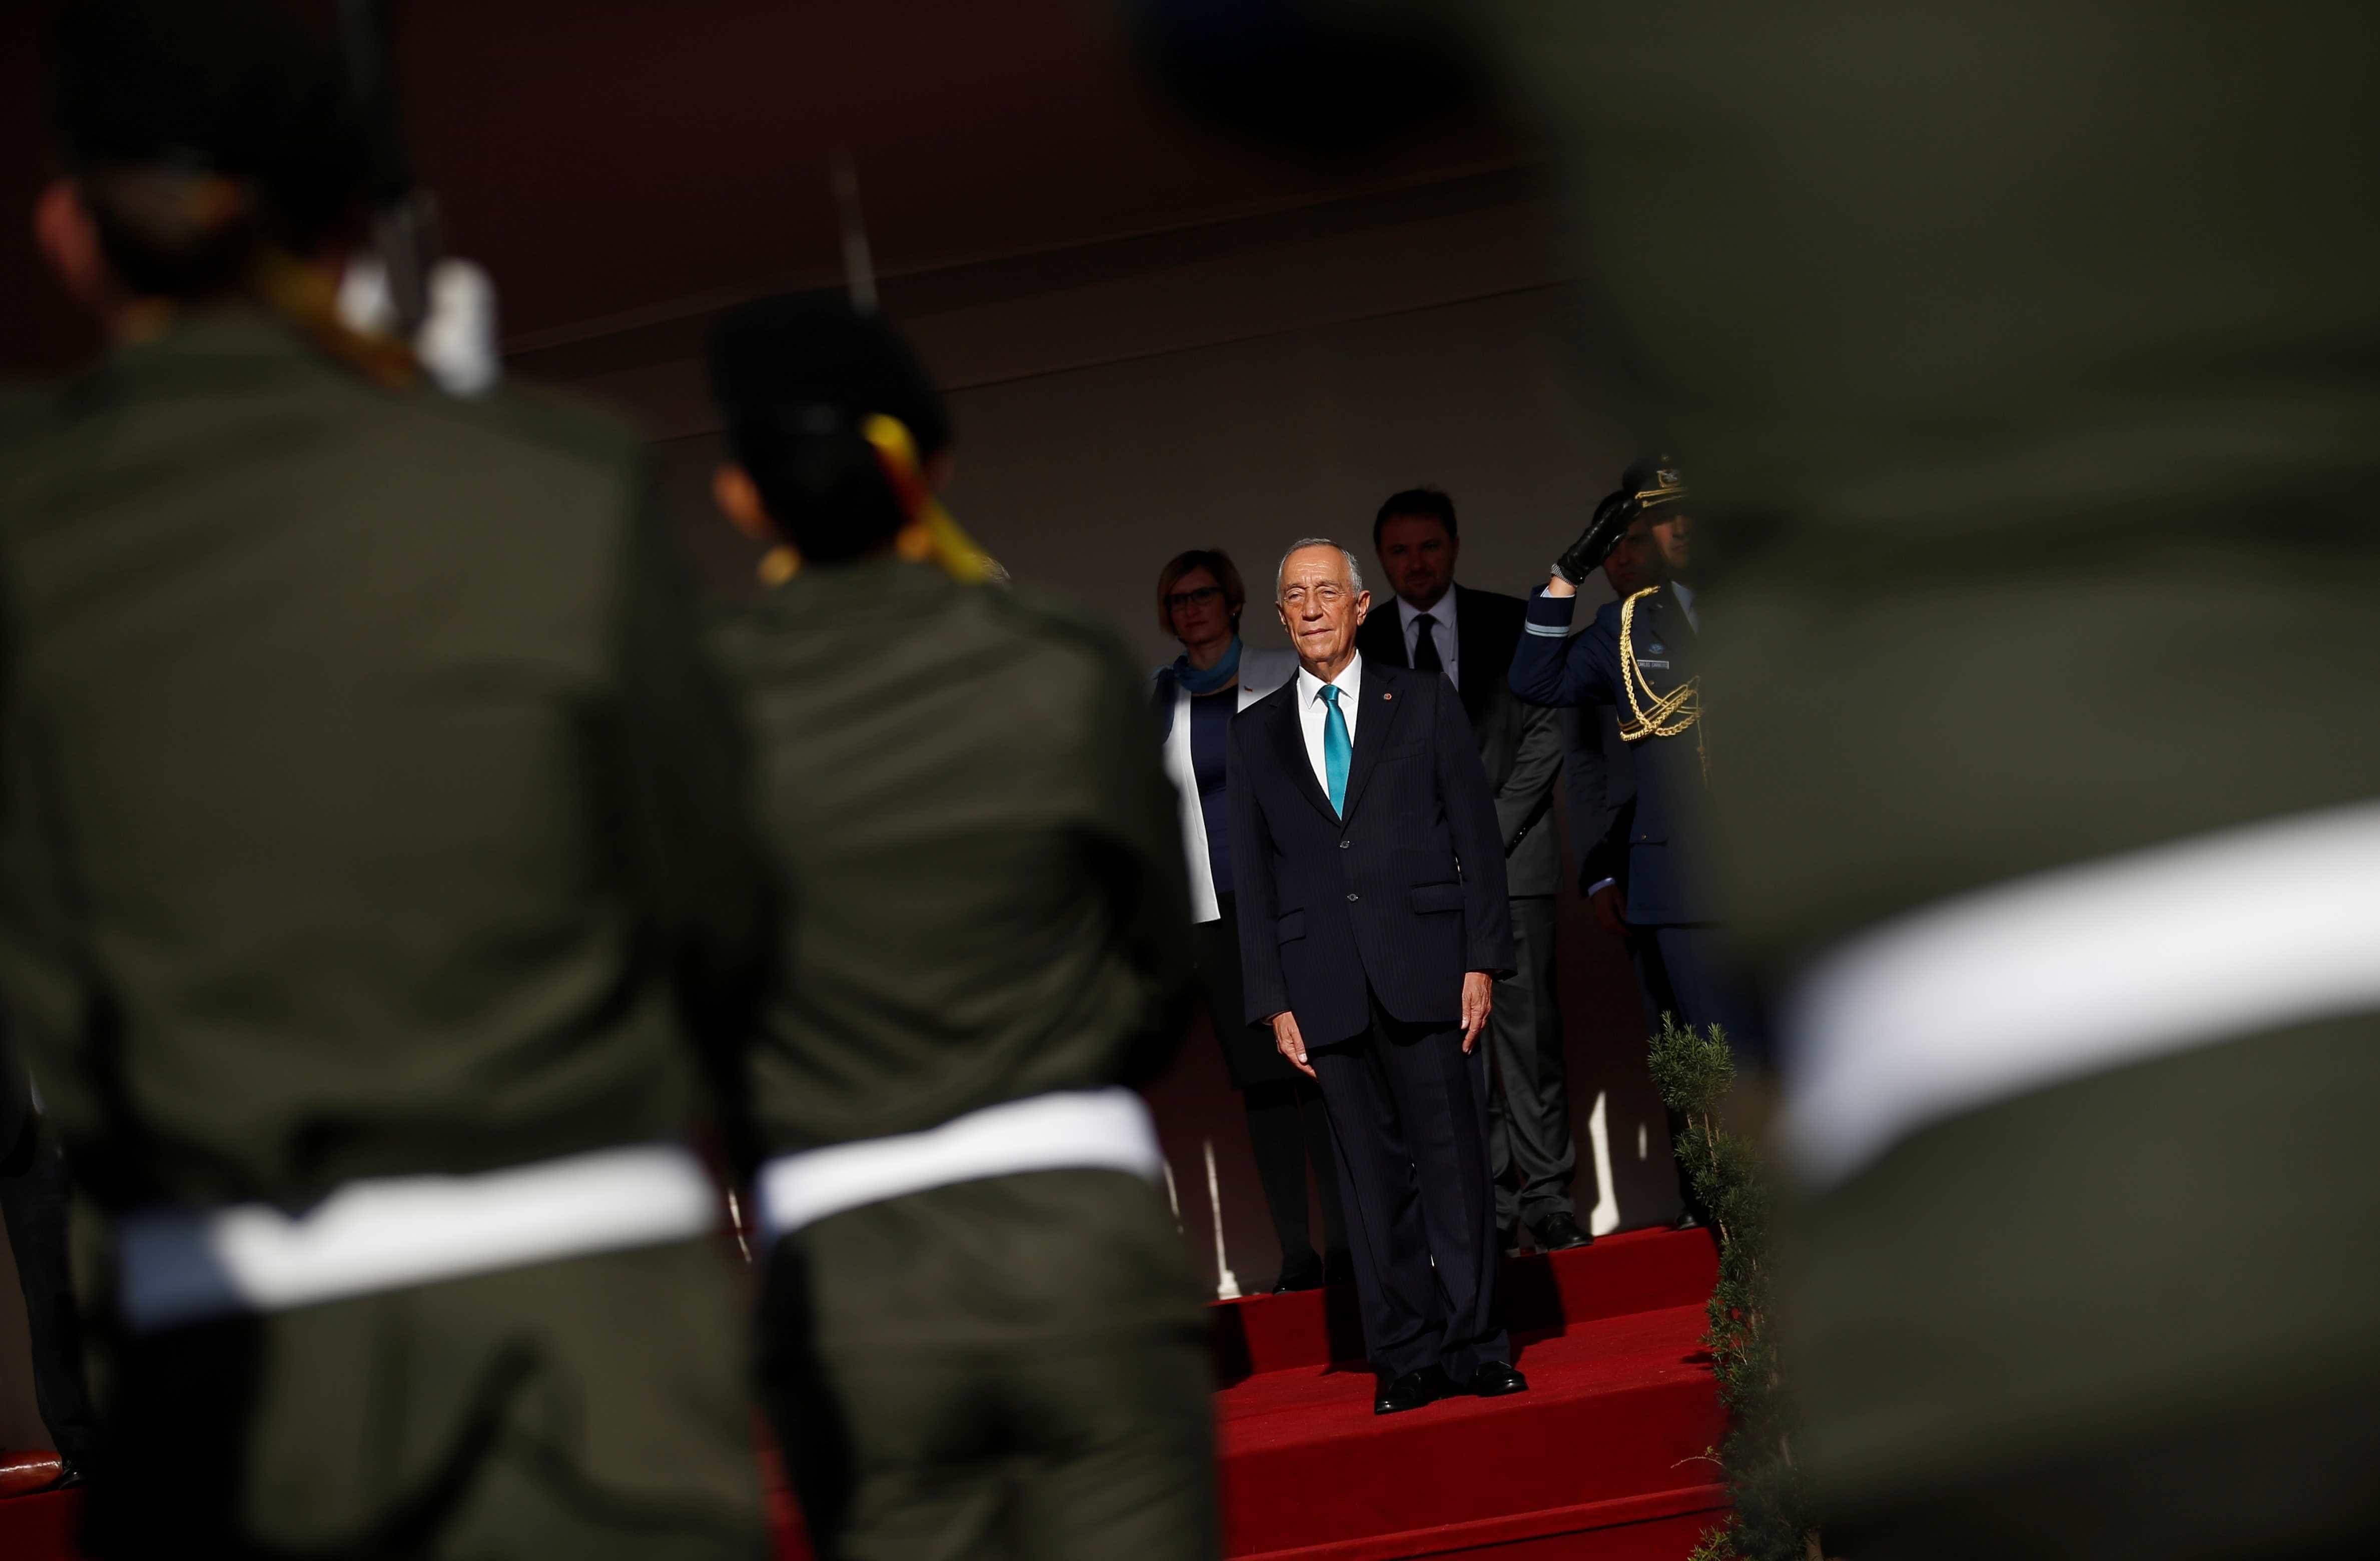 Presidente Marcelo vai estar presente na tomada de posse de Bolsonaro